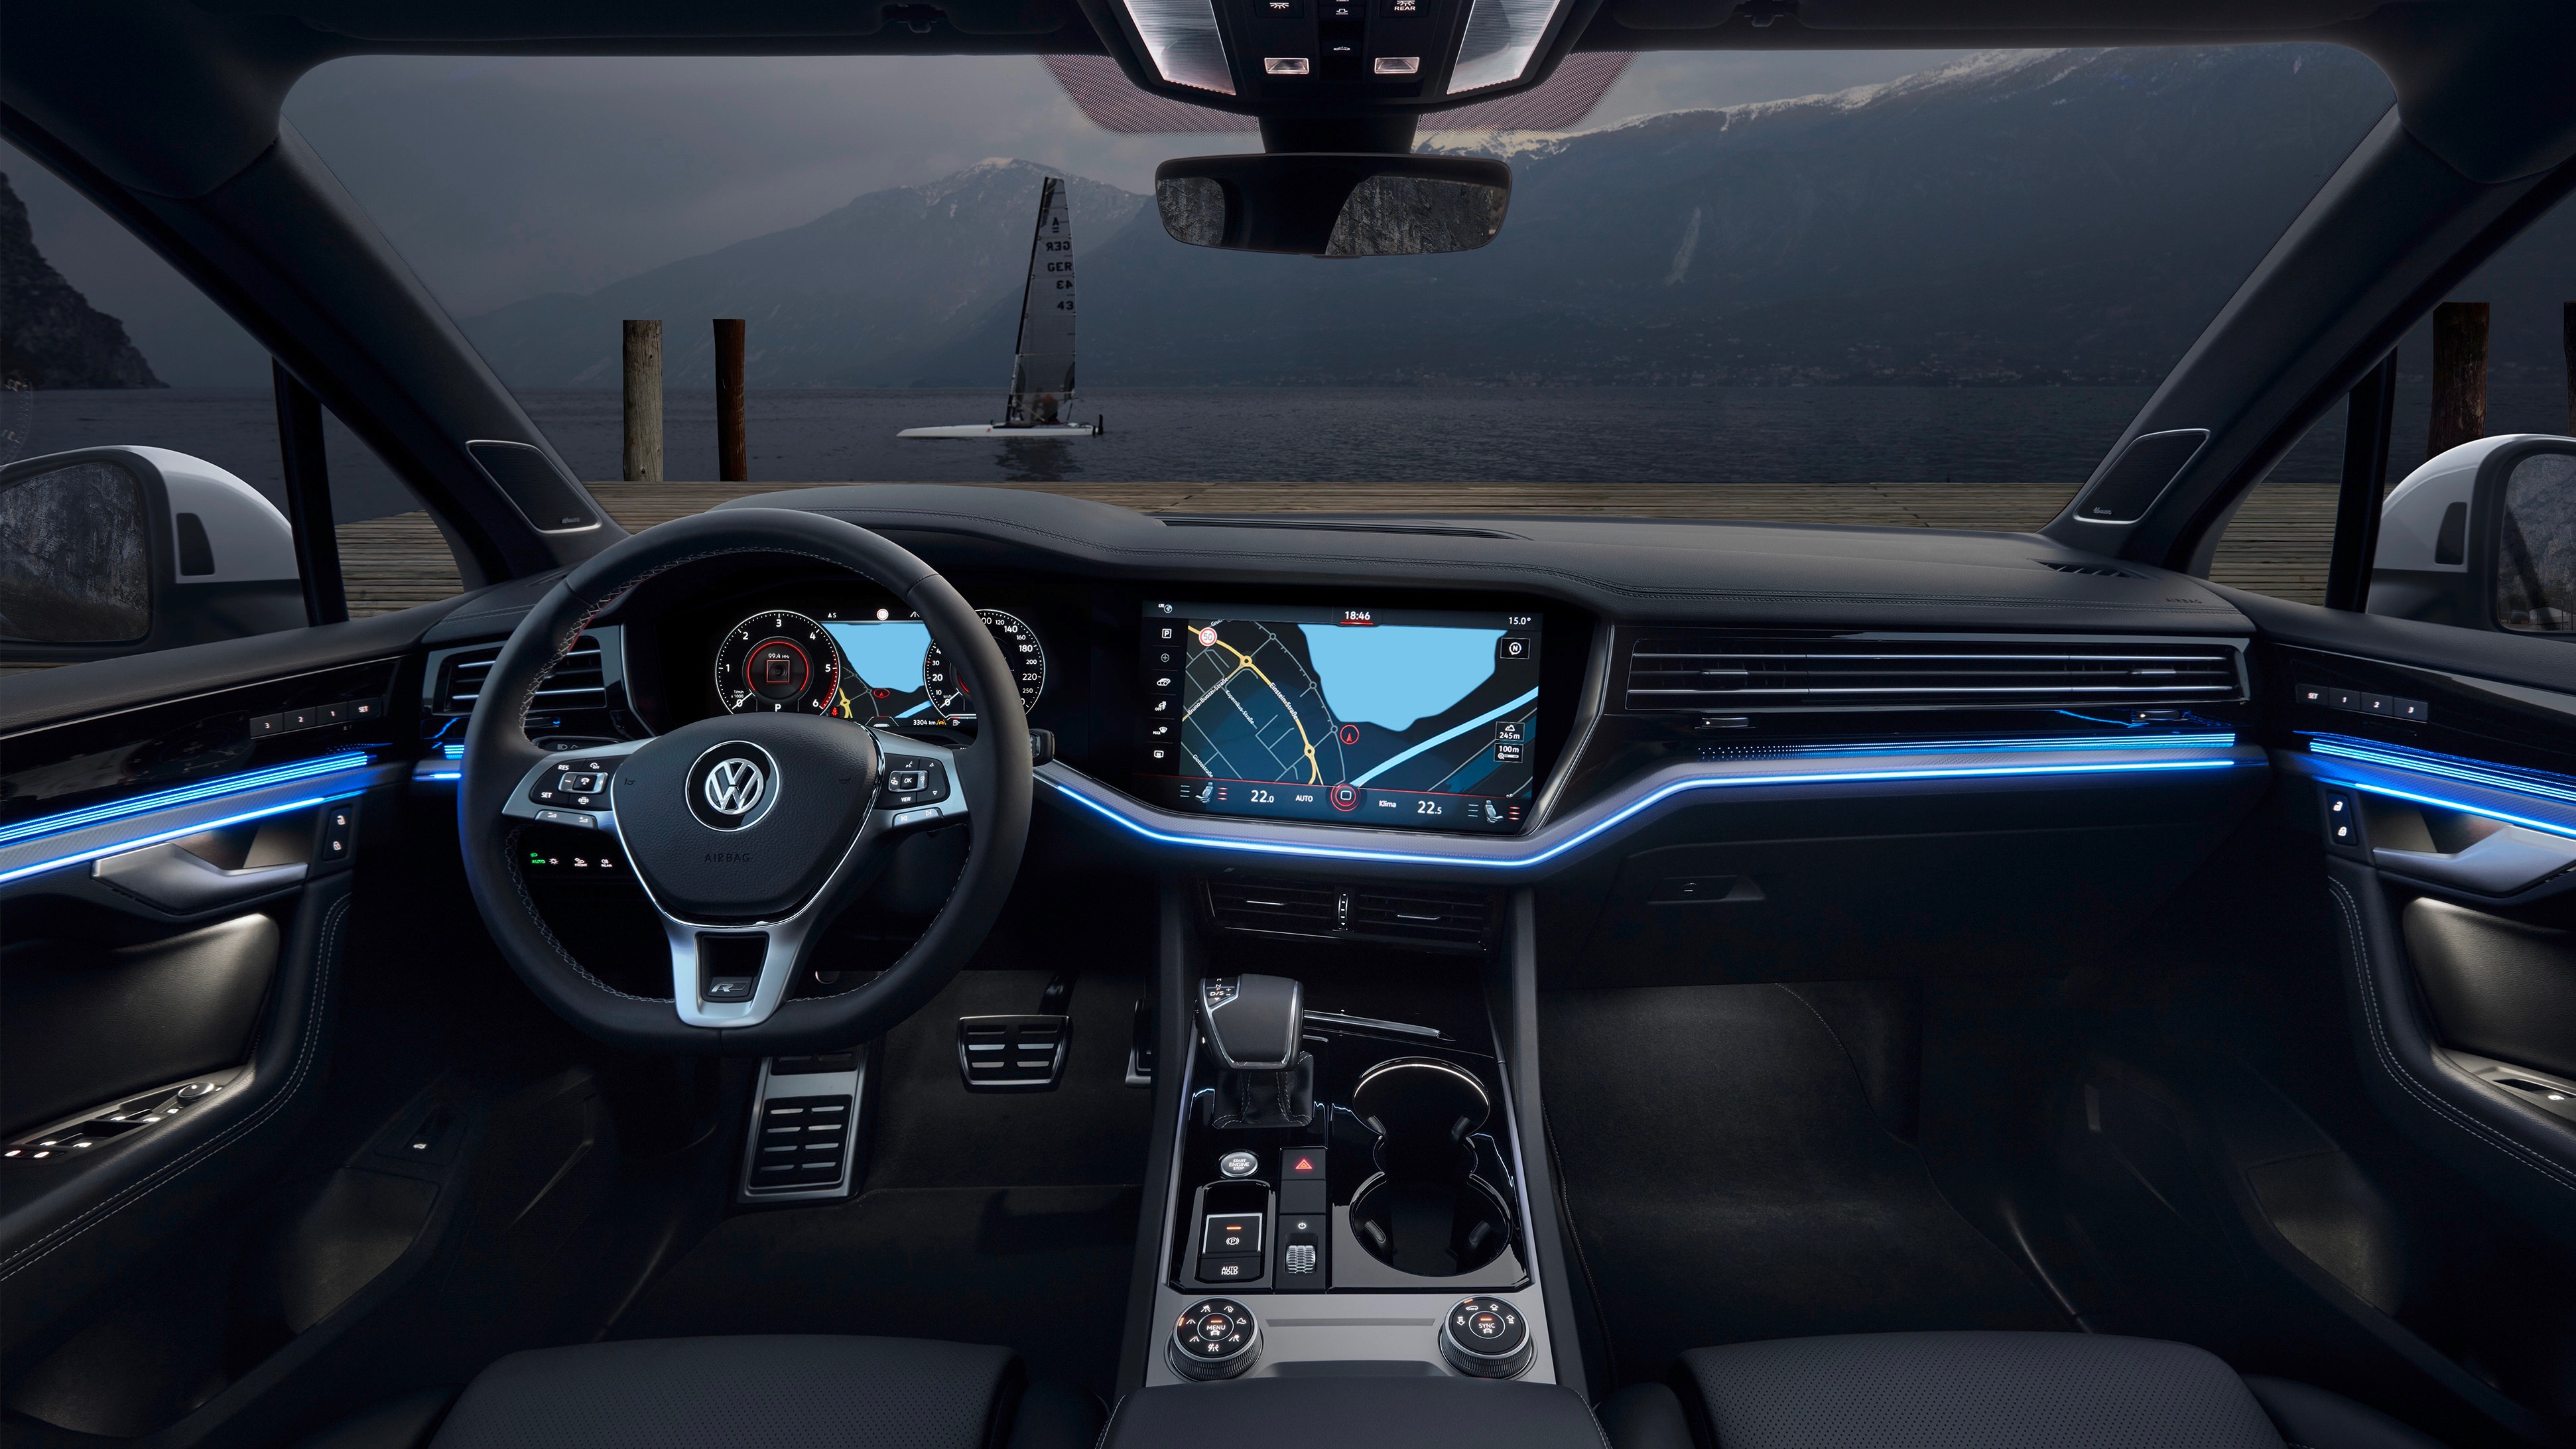 Volkswagen Touareg R-Line cabin night